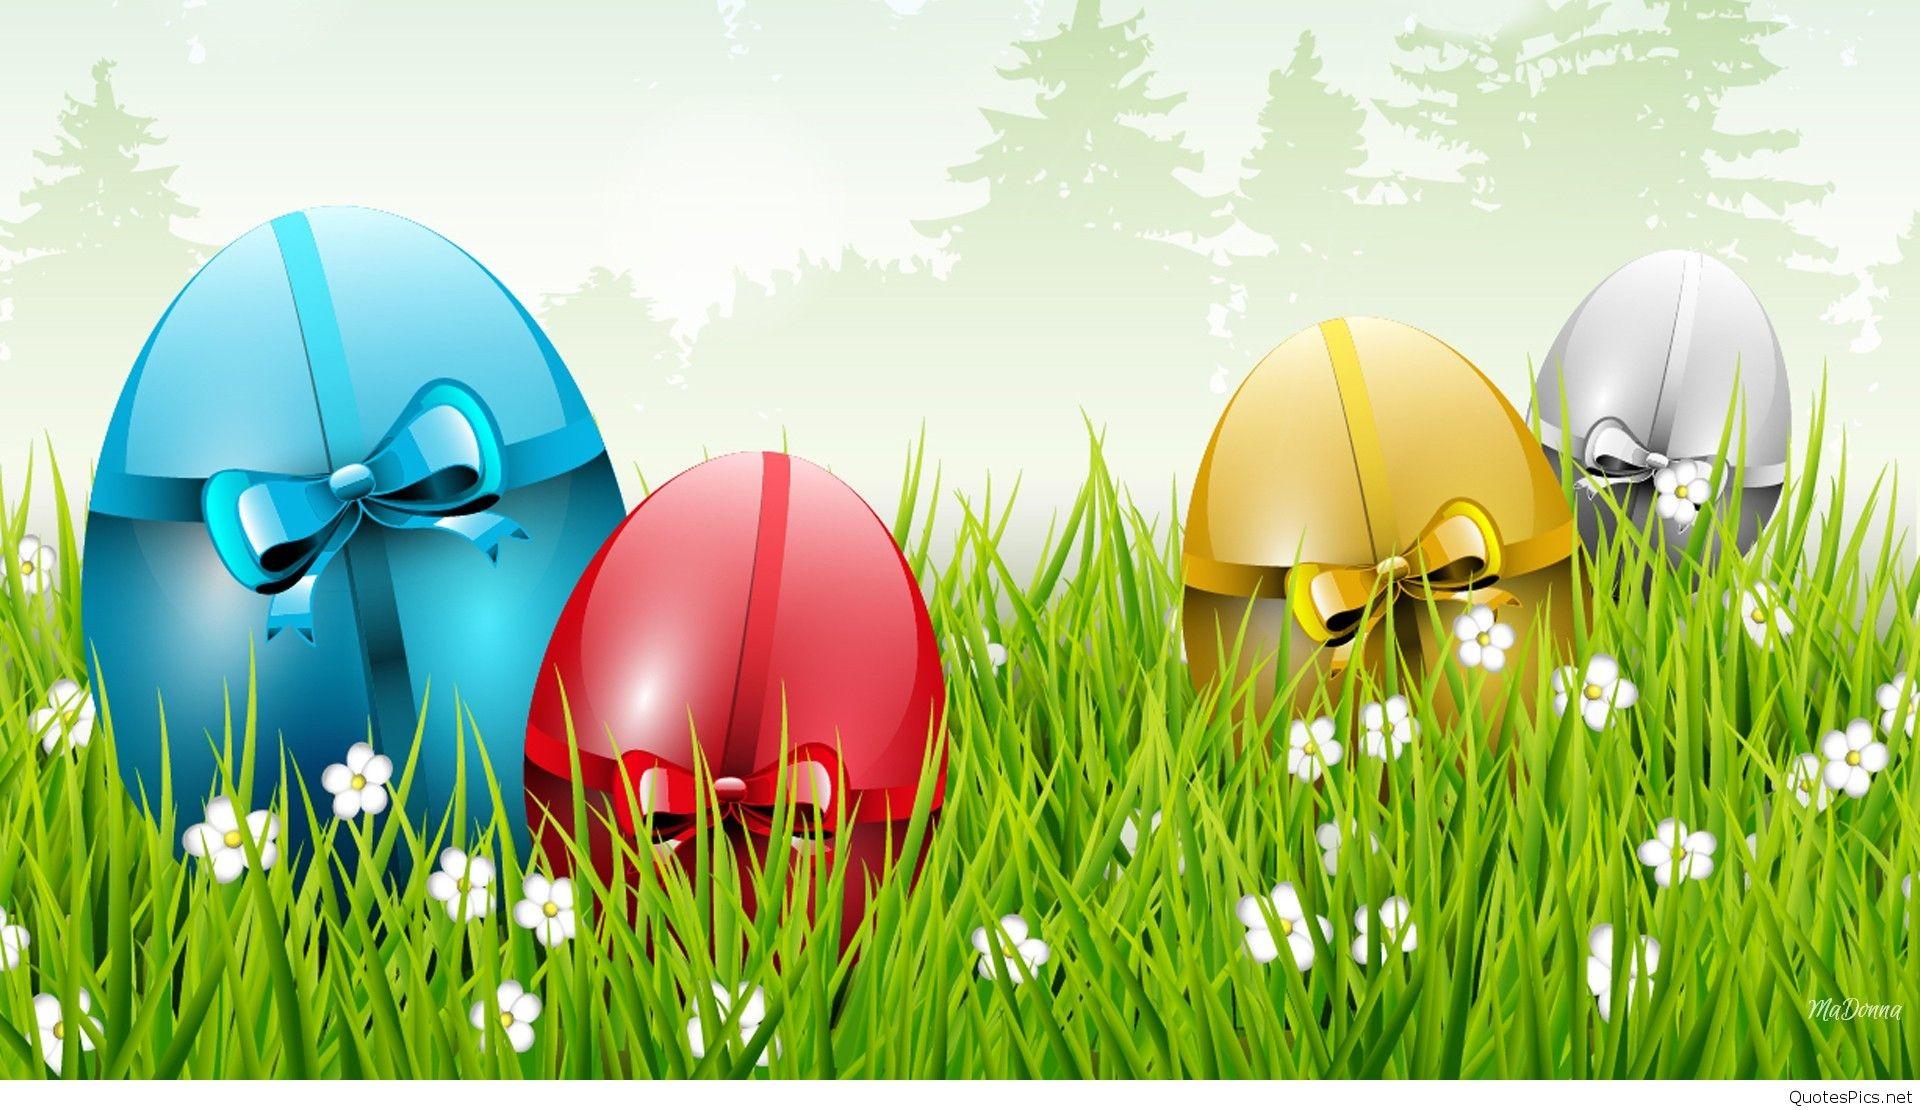 Easter wallpapers desktop 71 images - Easter desktop wallpaper ...